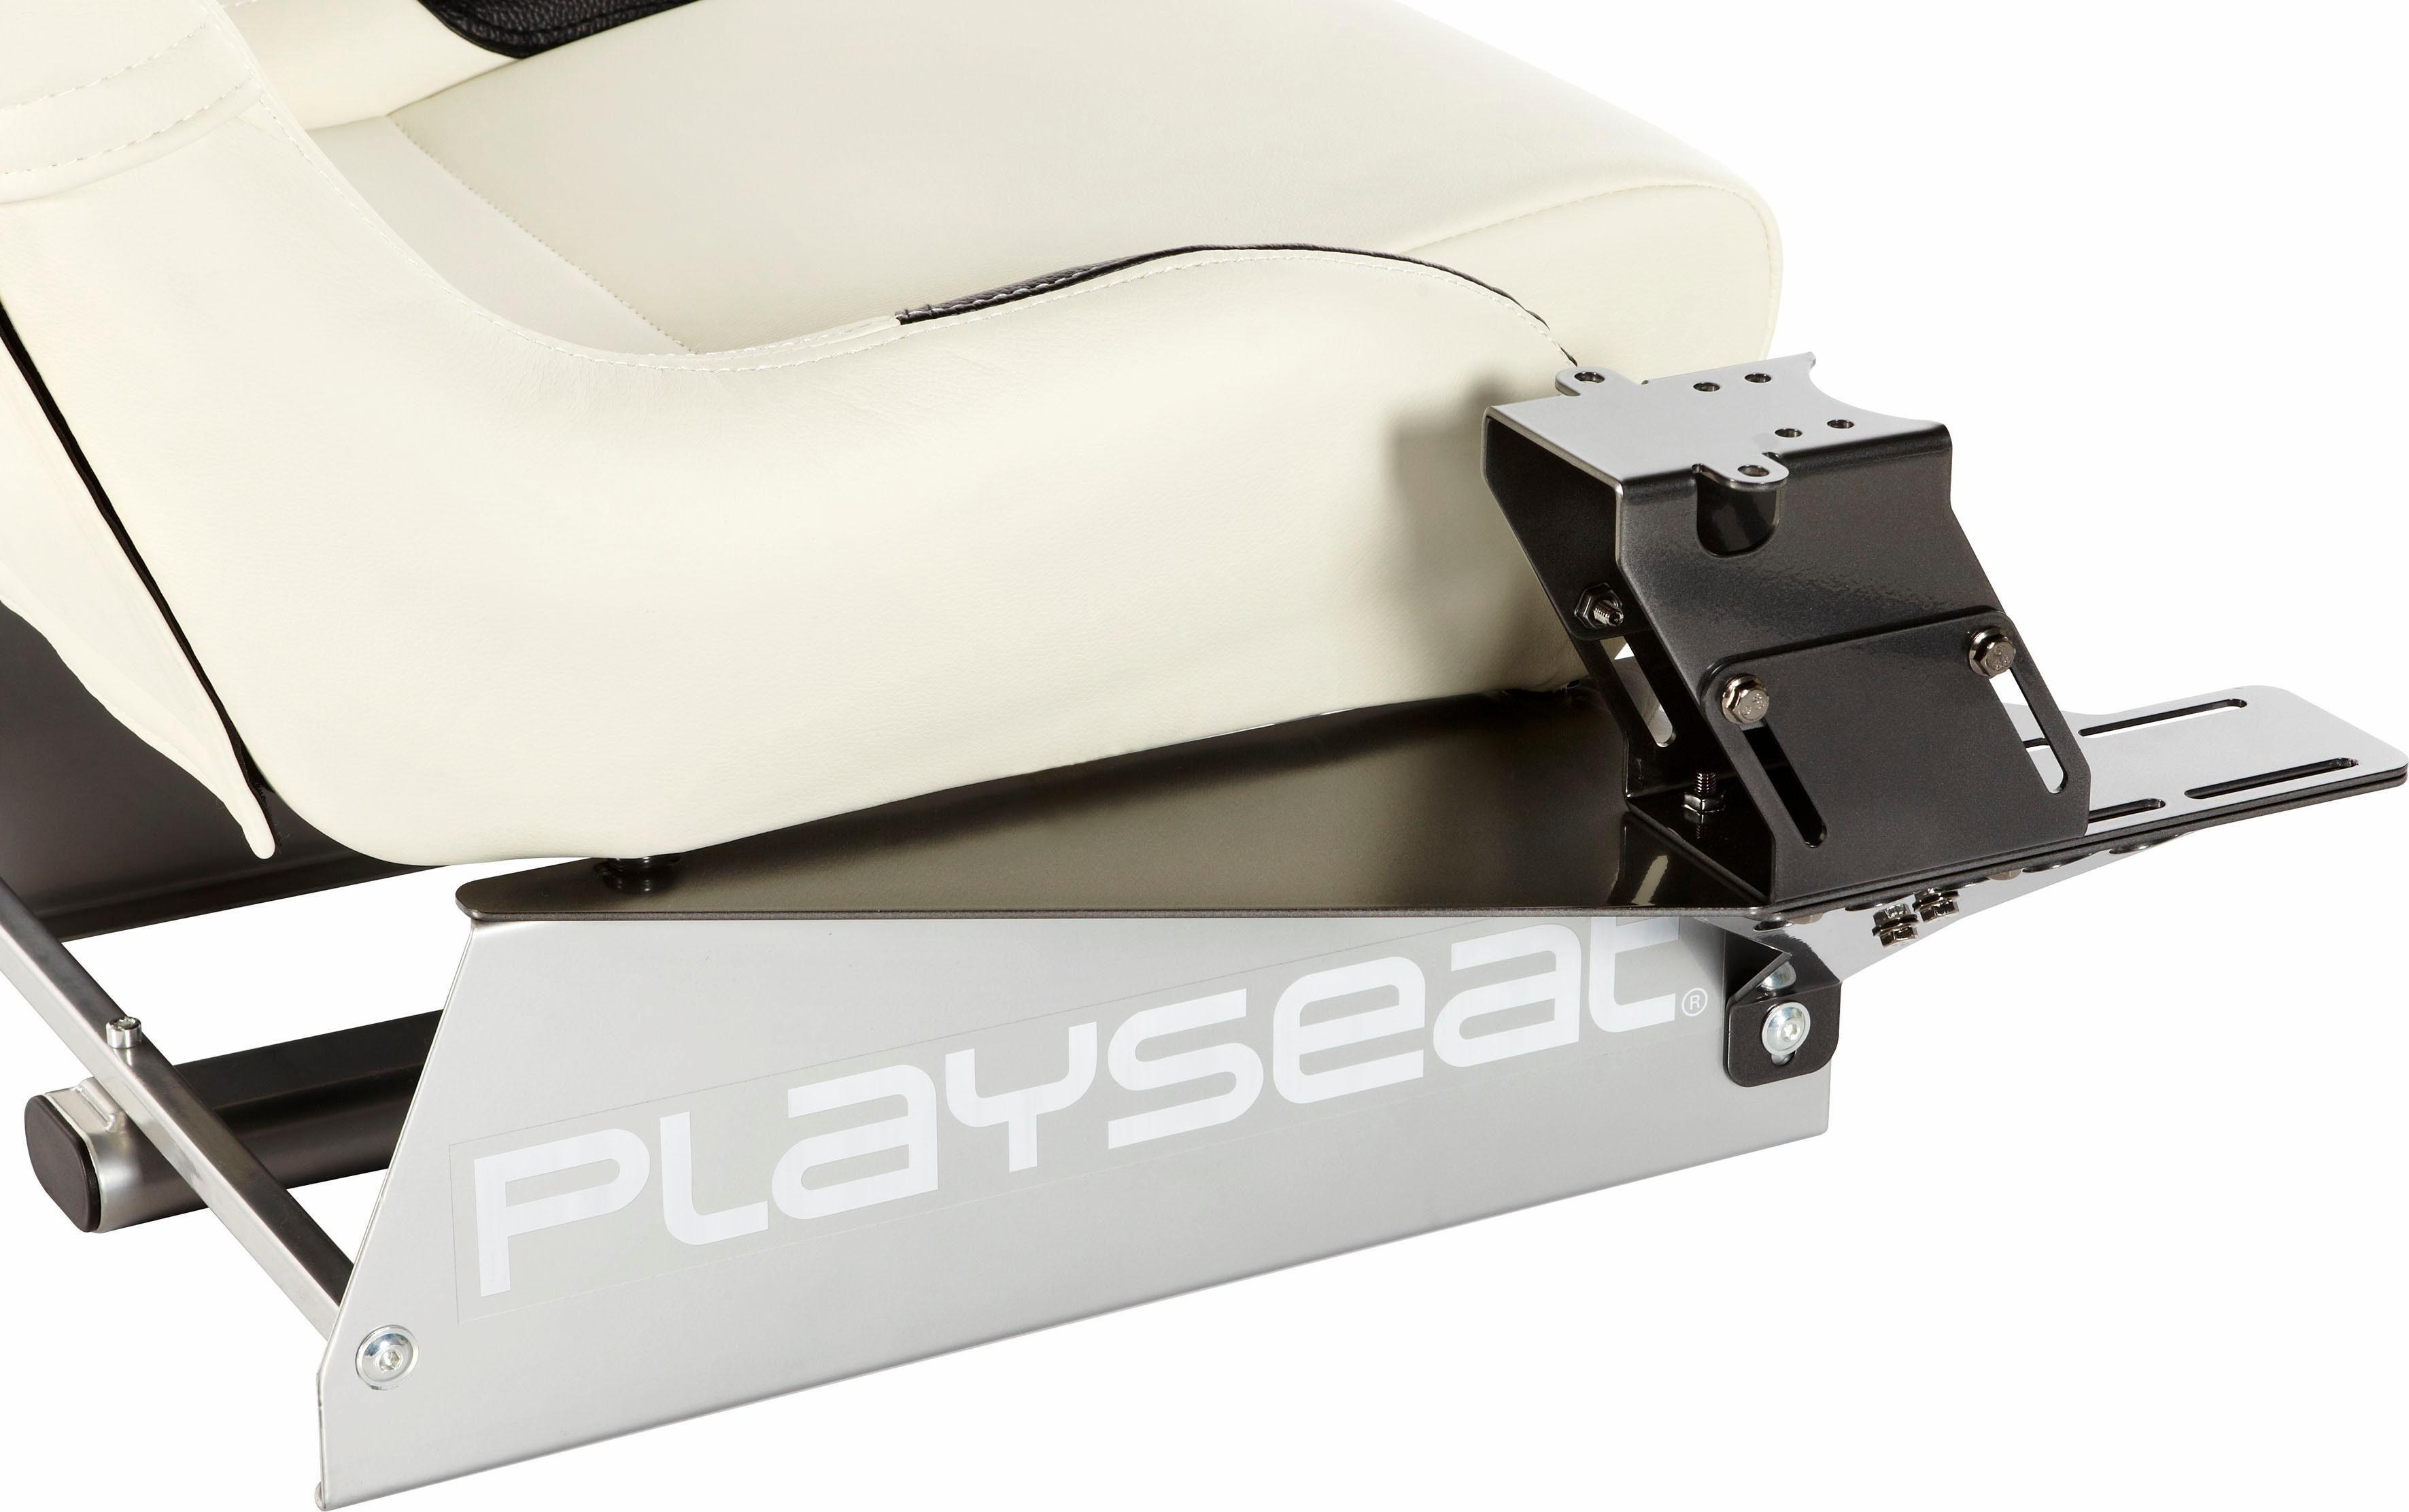 Playseats Gear Shiftholder Pro Schalthebel-Halterung